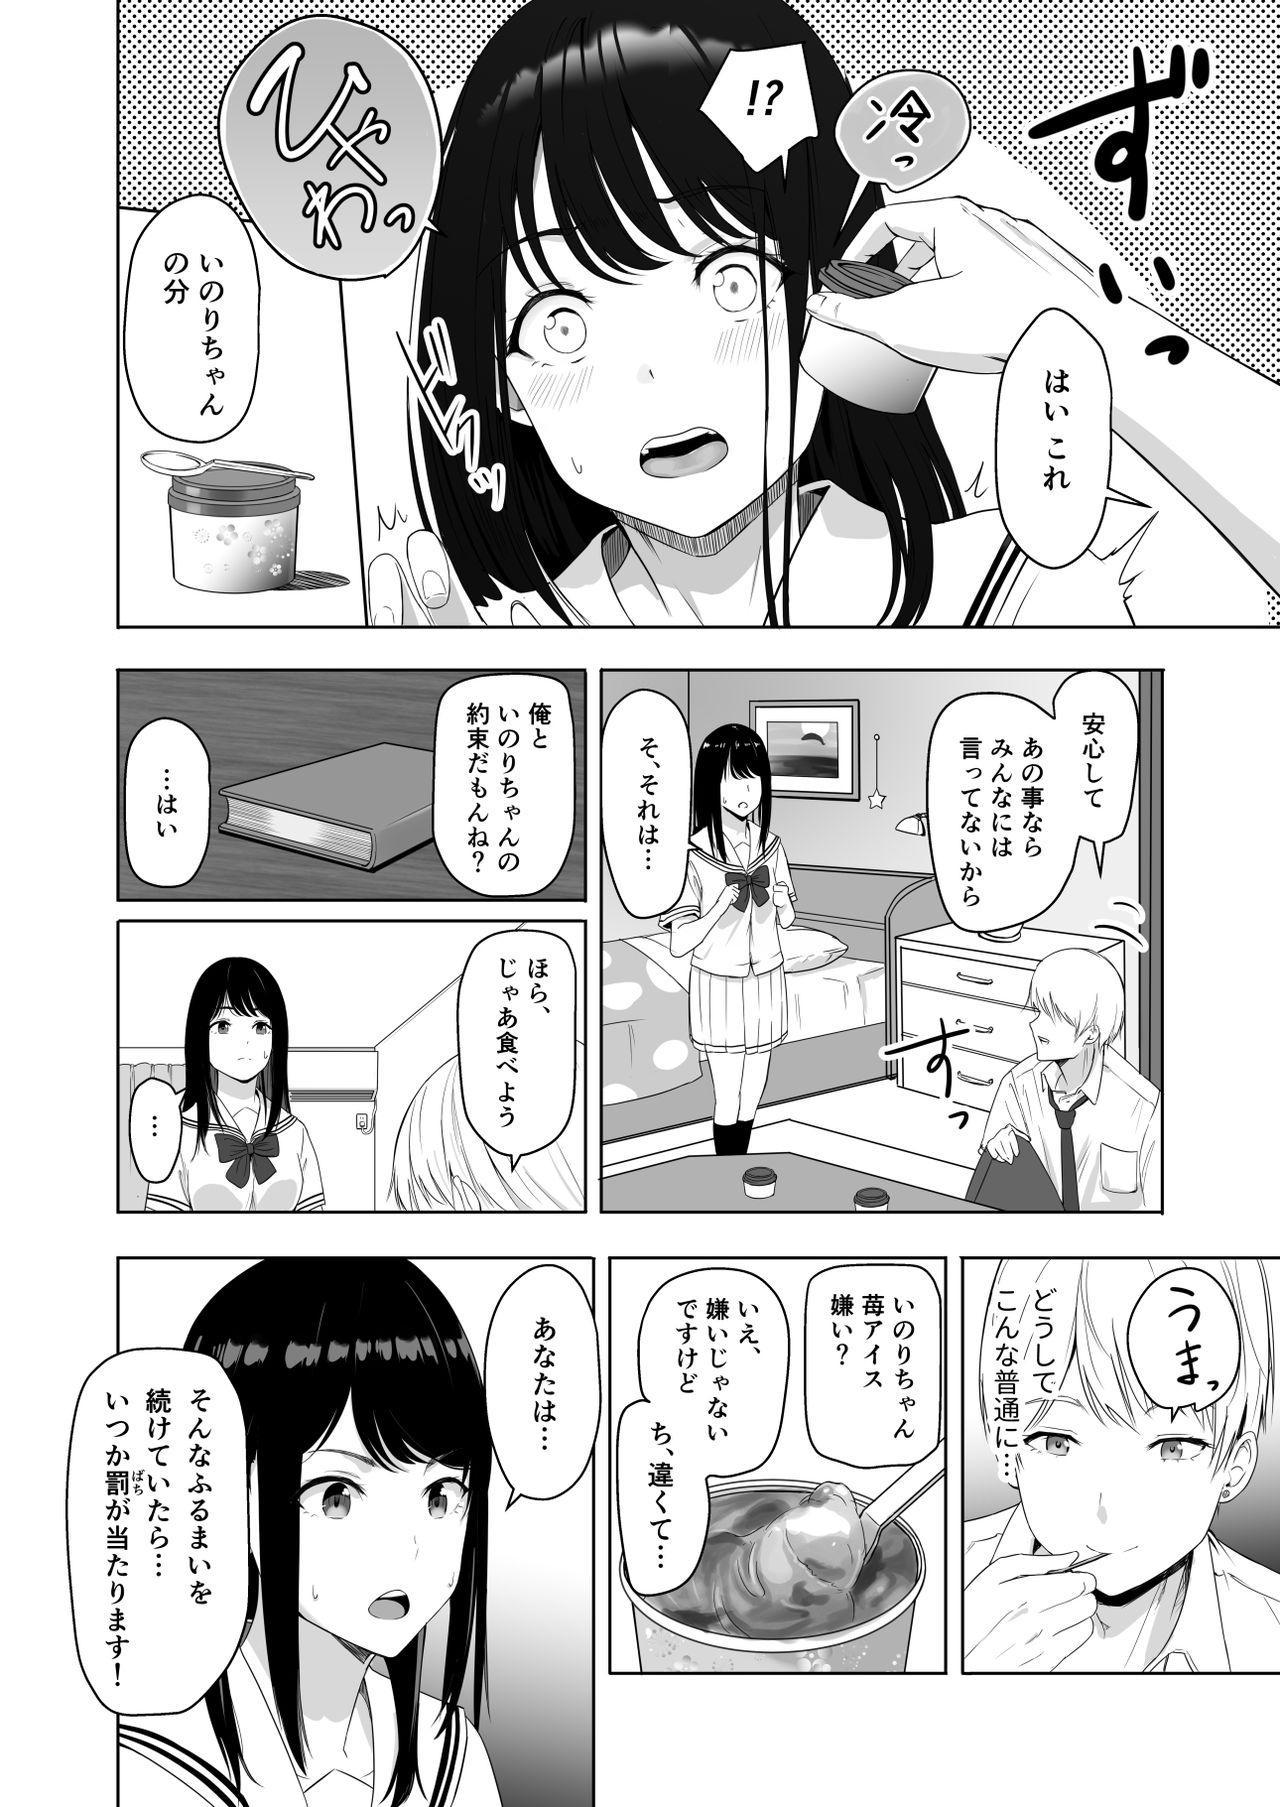 Kimi ga Tame. 2 Ichikawa Inori 38